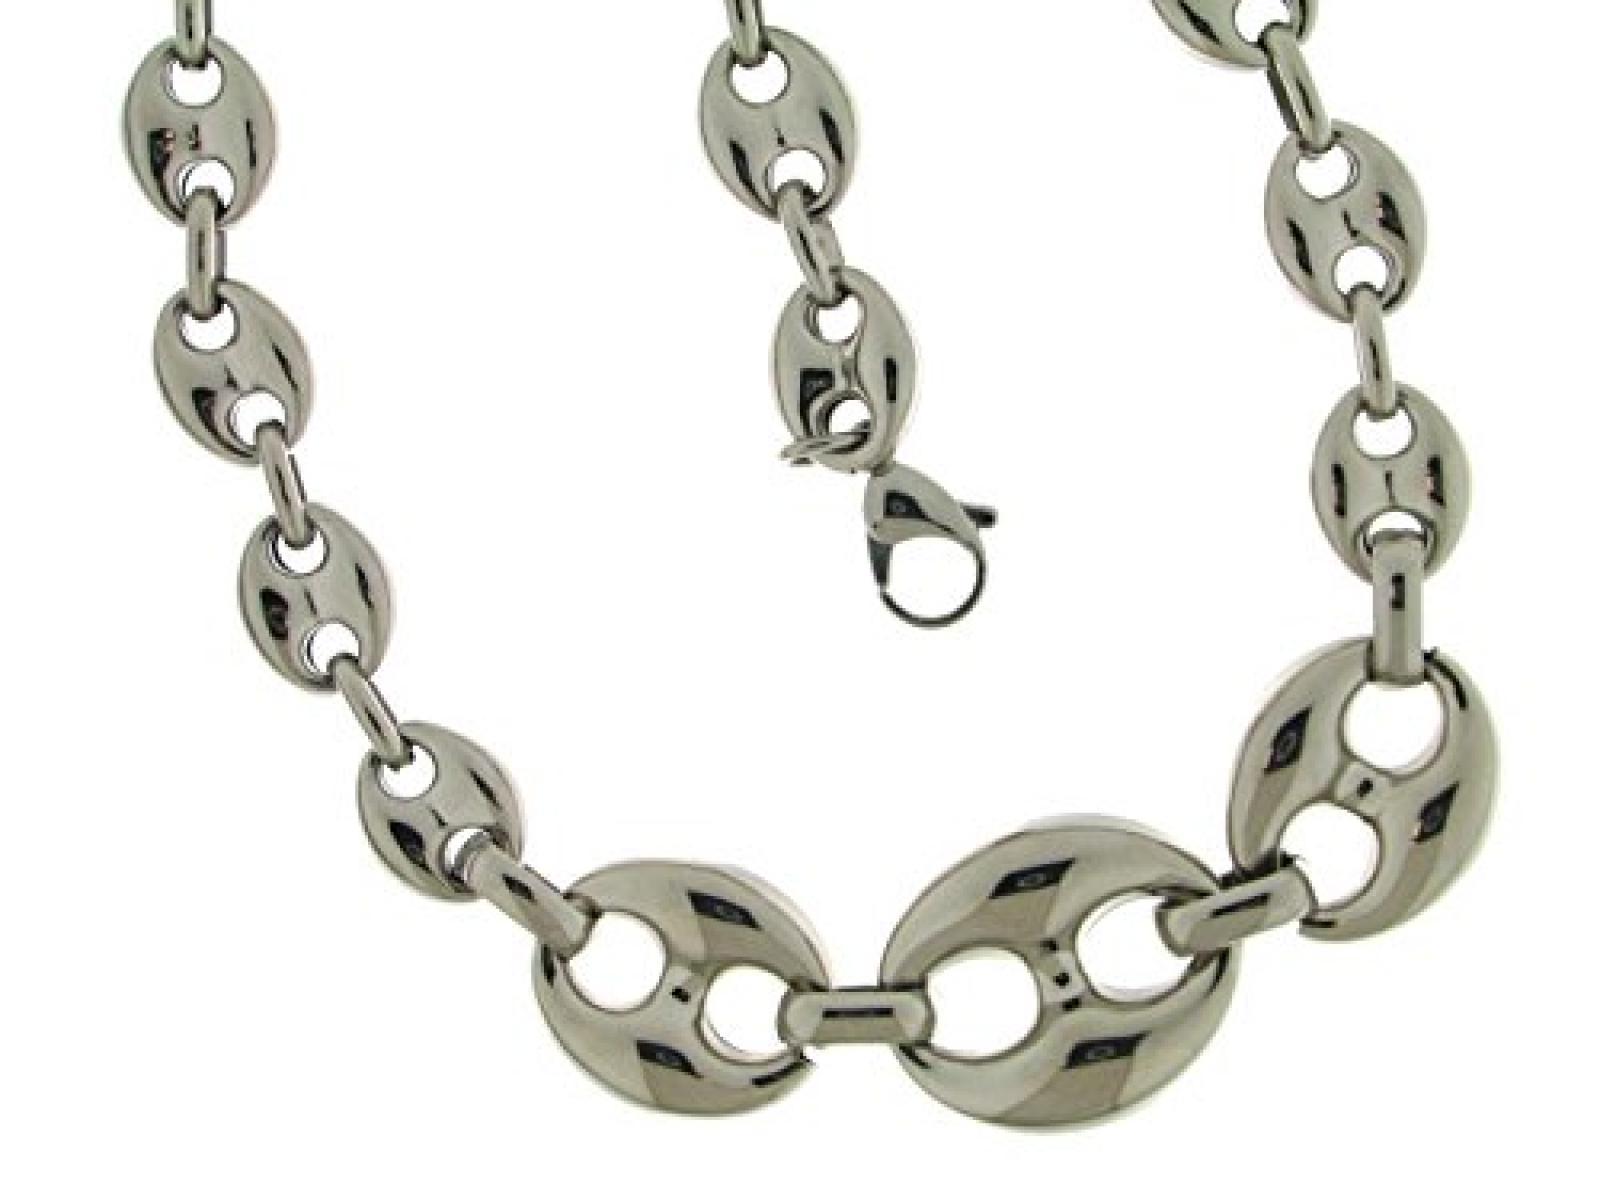 Kettenworld Damen Halskette Edelstahl 337152